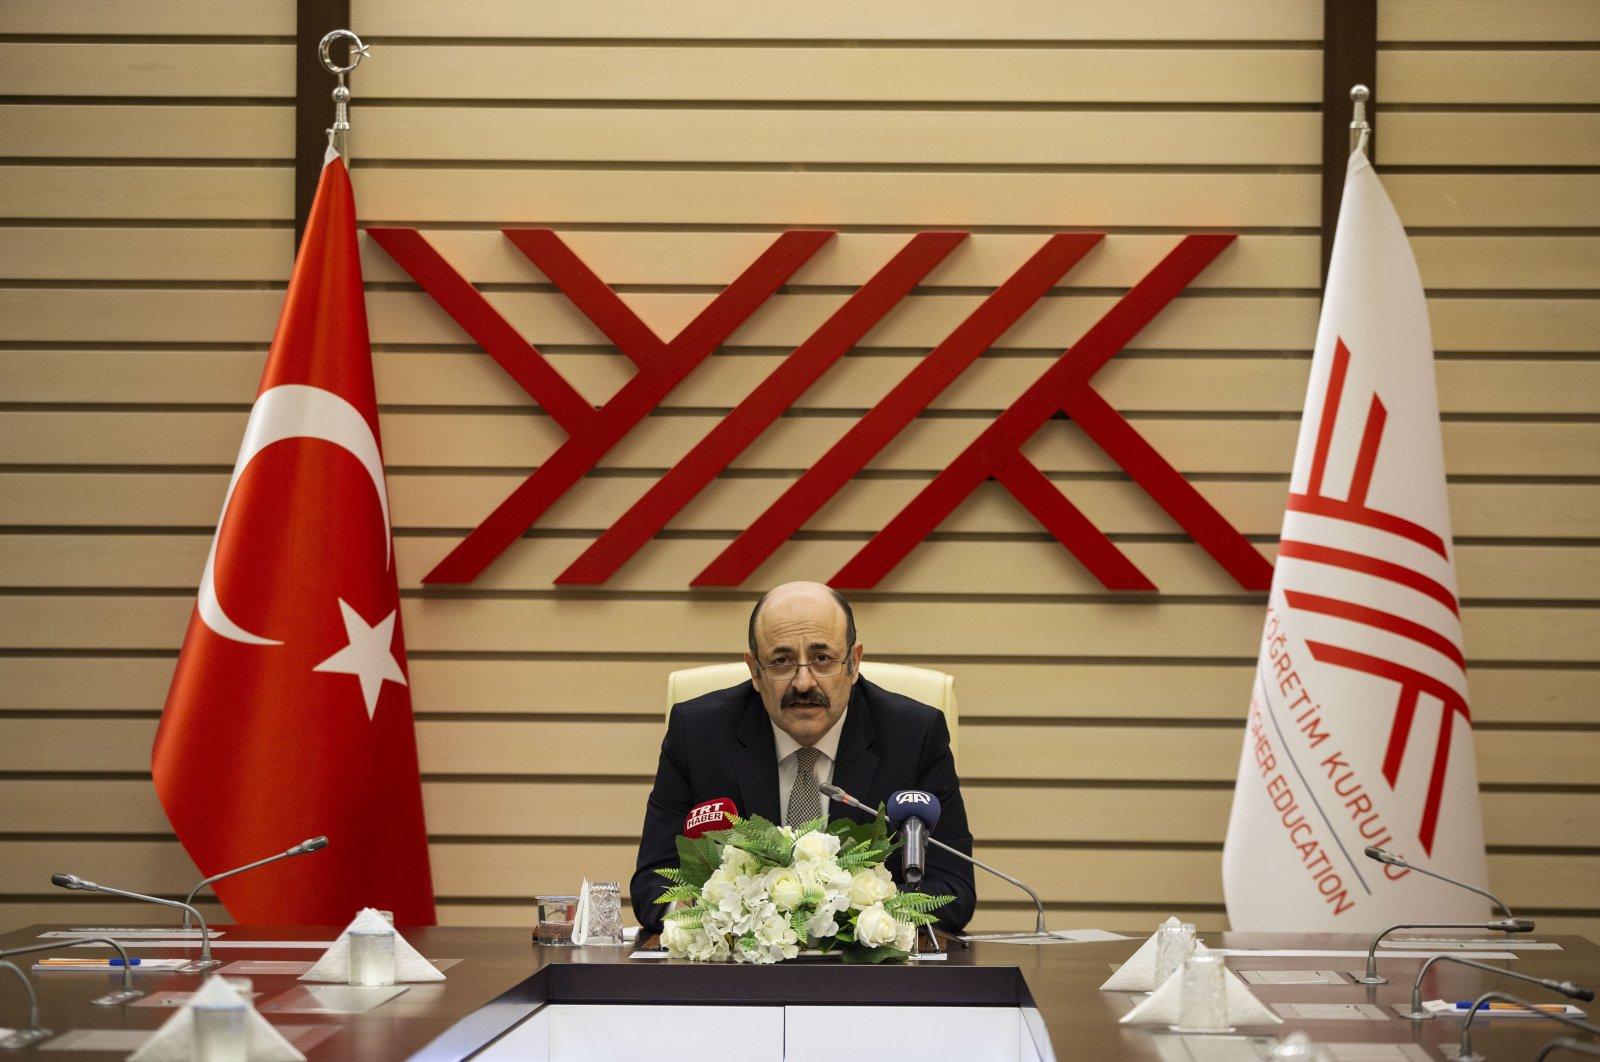 YÖK President Yekta Saraç during a press conference, Ankara, Turkey, Feb. 10, 2021. (AA)